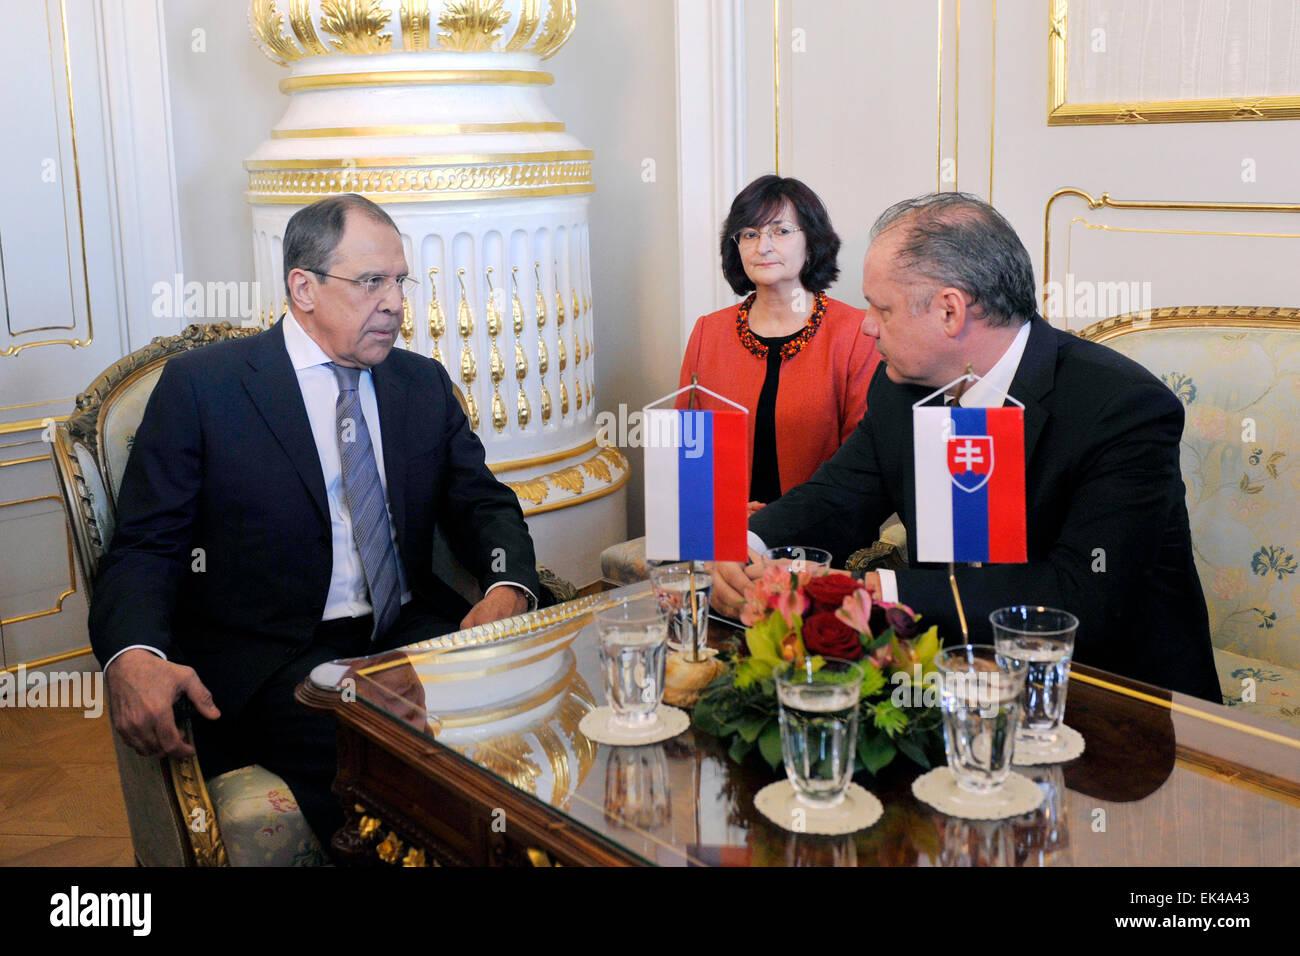 Bratislava. 4th Apr, 2015. Slovak President Andrej Kiska, right, and Russian Foreign Minister Sergey Lavrov meets - Stock Image